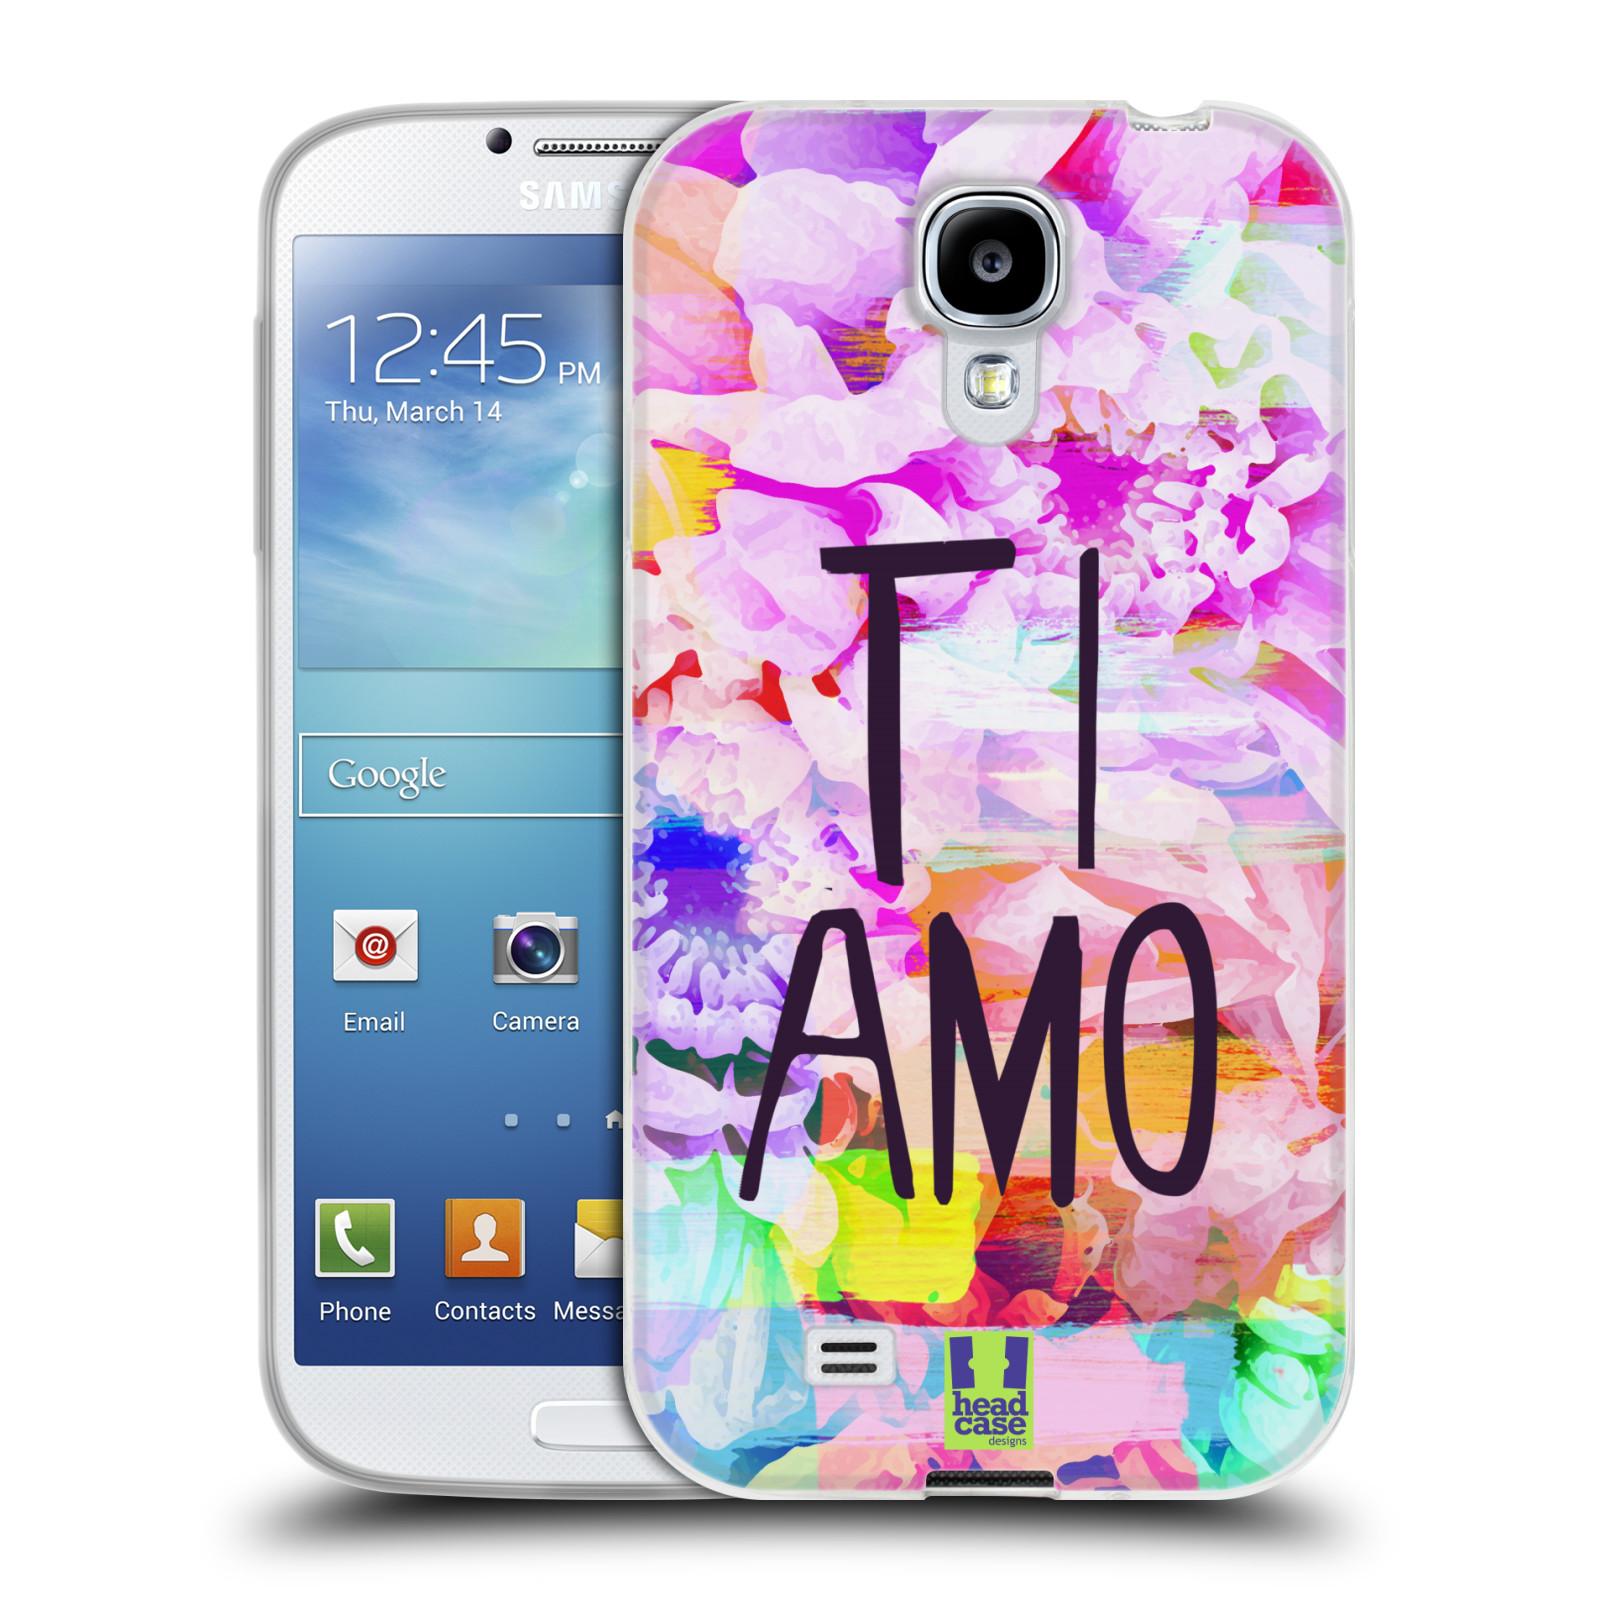 Silikonové pouzdro na mobil Samsung Galaxy S4 HEAD CASE Květy Ti Amo (Silikonový kryt či obal na mobilní telefon Samsung Galaxy S4 GT-i9505 / i9500)